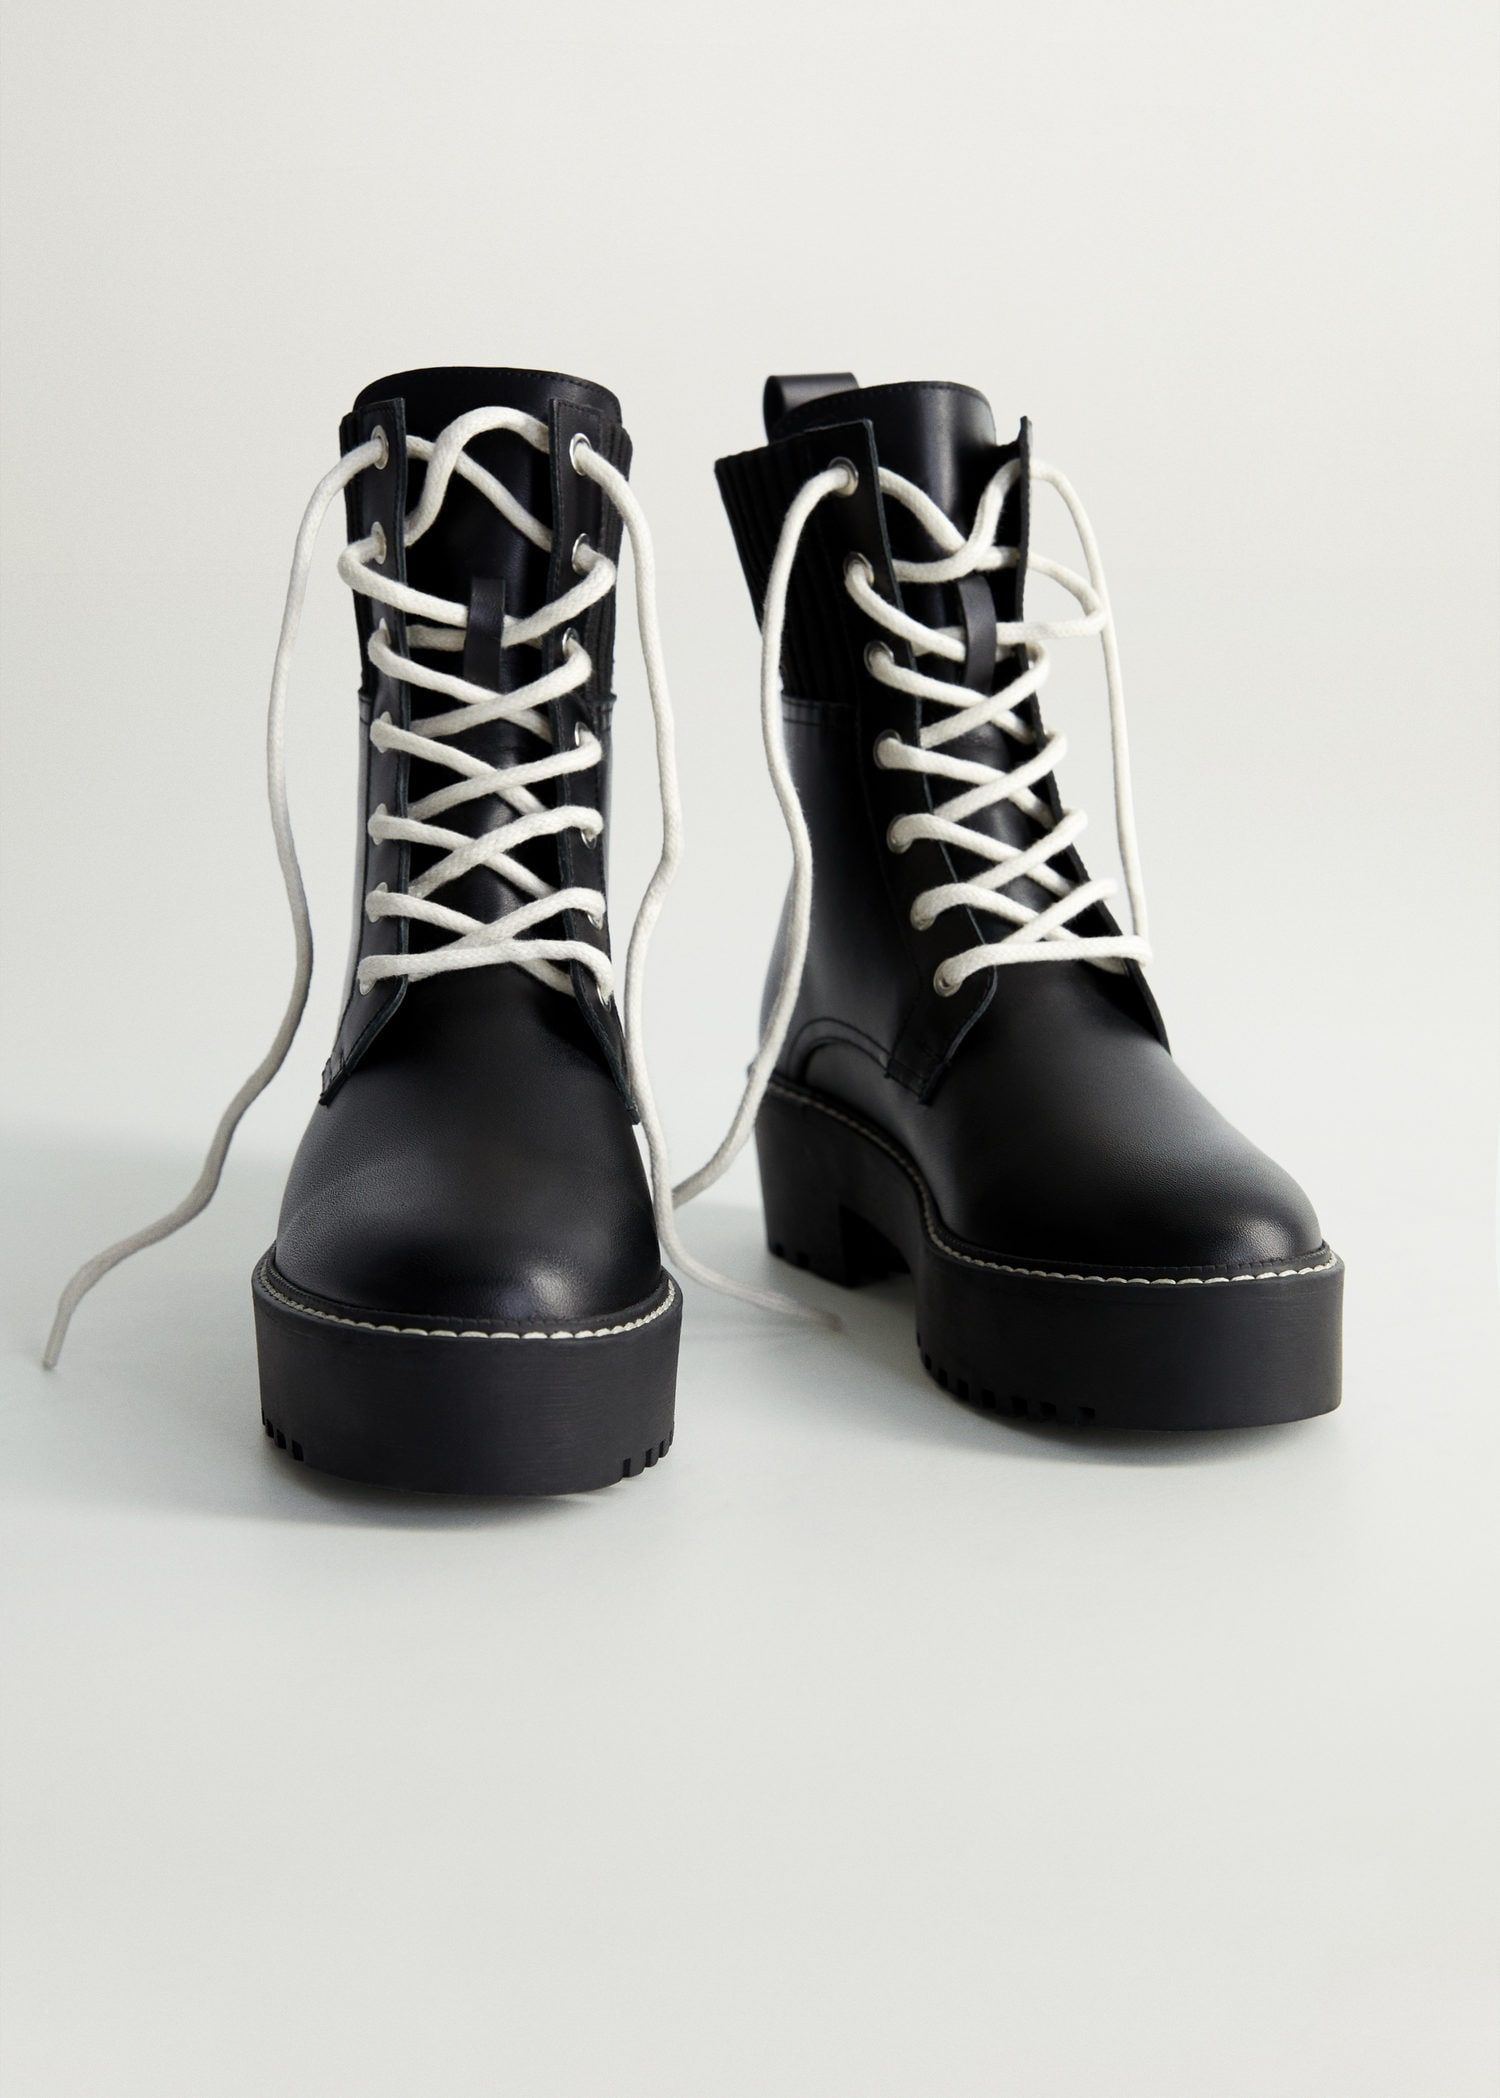 57 tendencias de botas militares para explorar | Botas